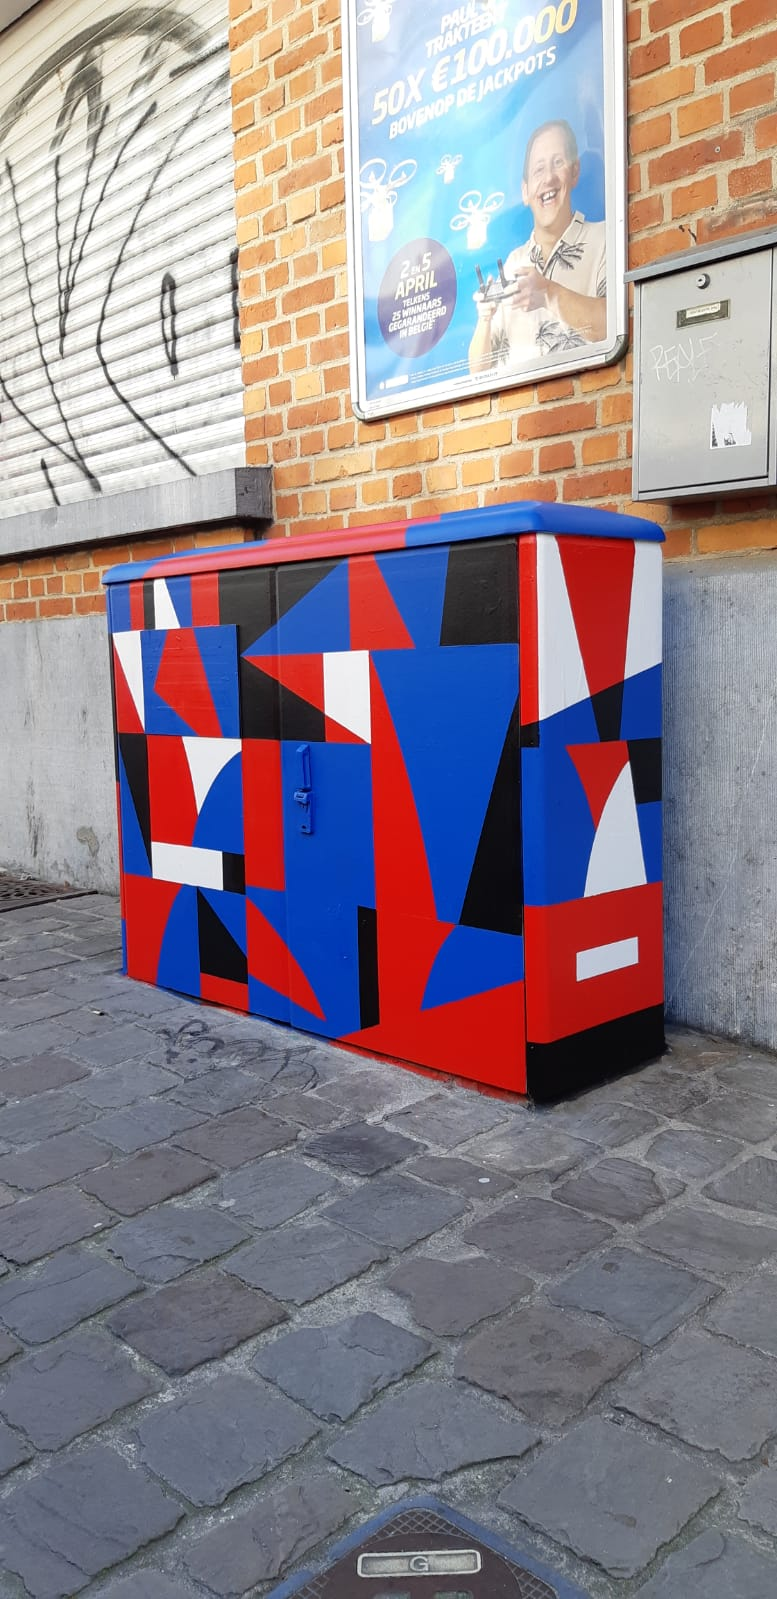 mobilier-urbain-_-artiste-B-Hendlisz-_-Ixelles2-copie.jpg